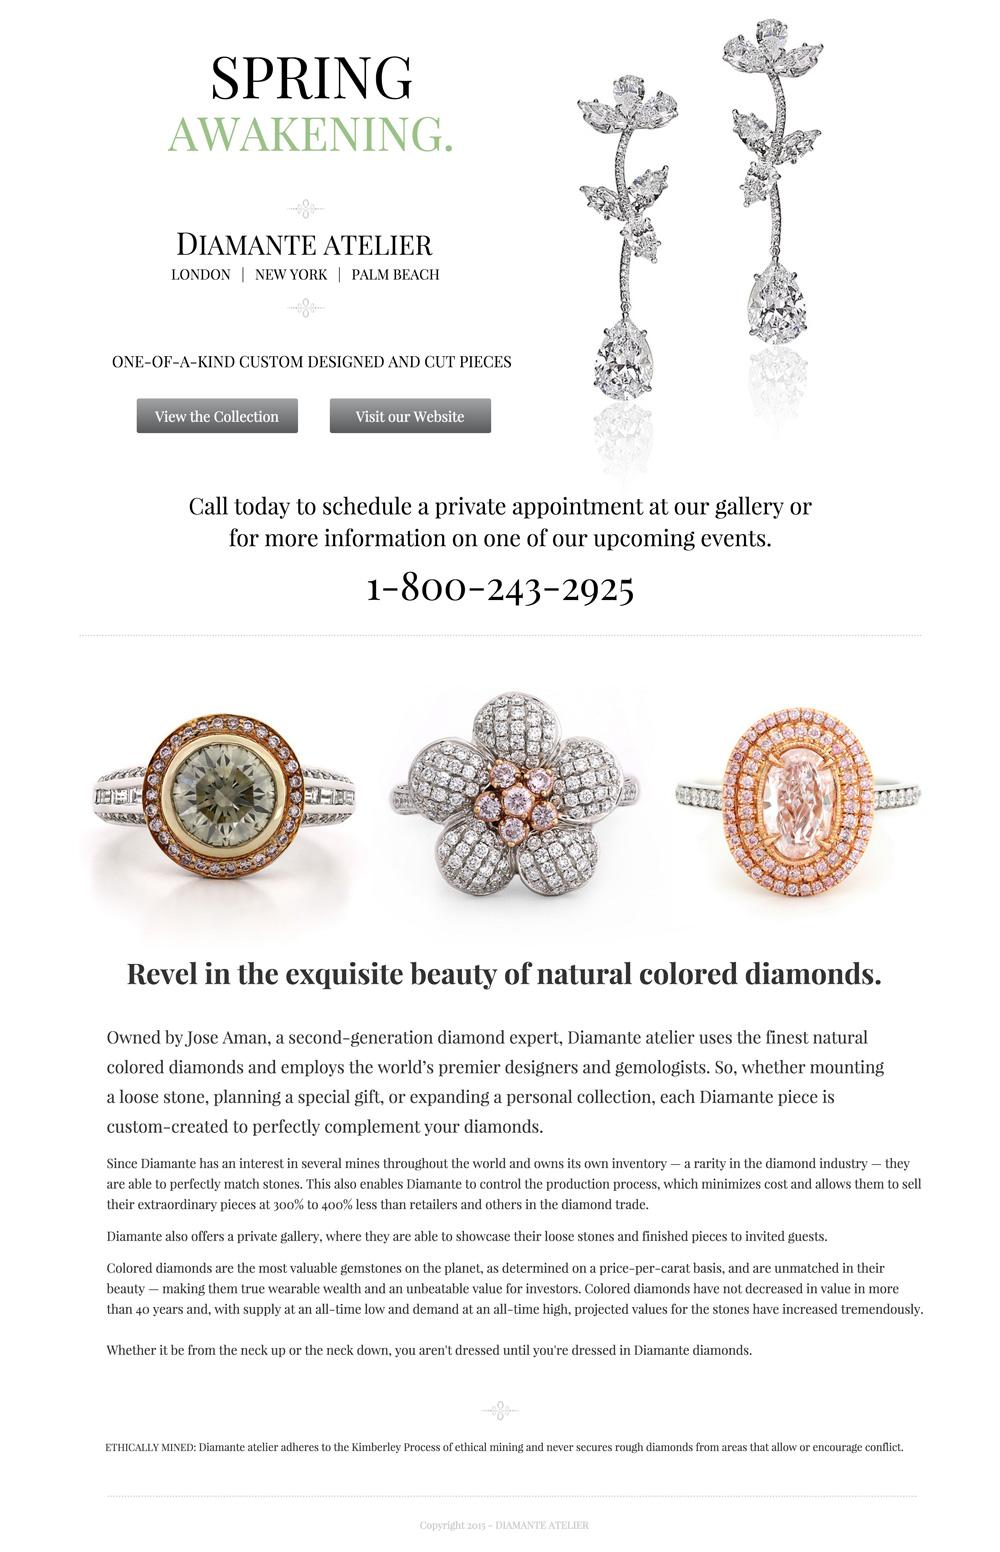 collection.diamanteatelier.com-spring-awakening-.jpg